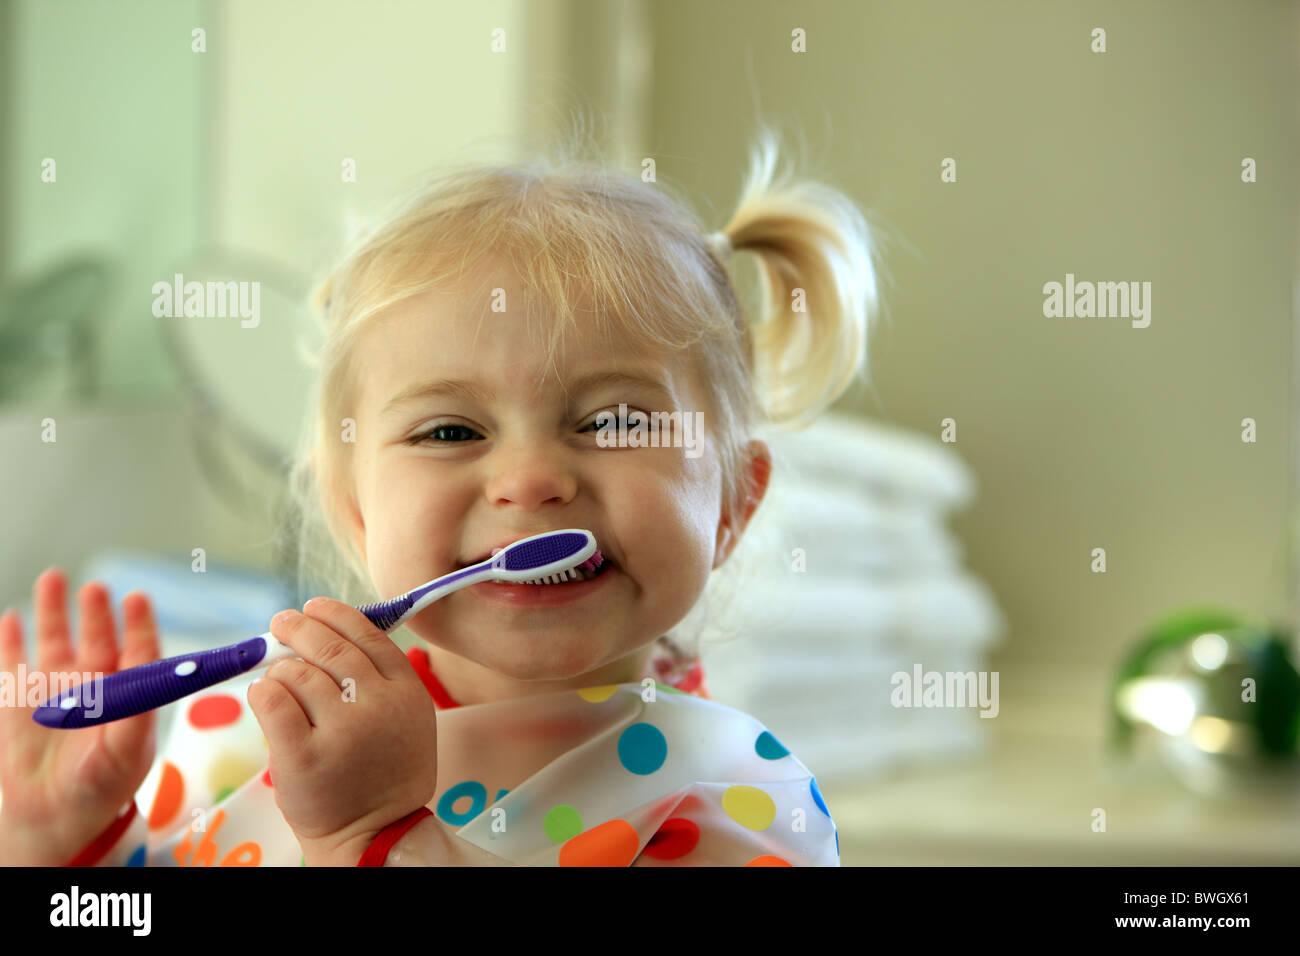 2 year old girl brushing her teeth - Stock Image